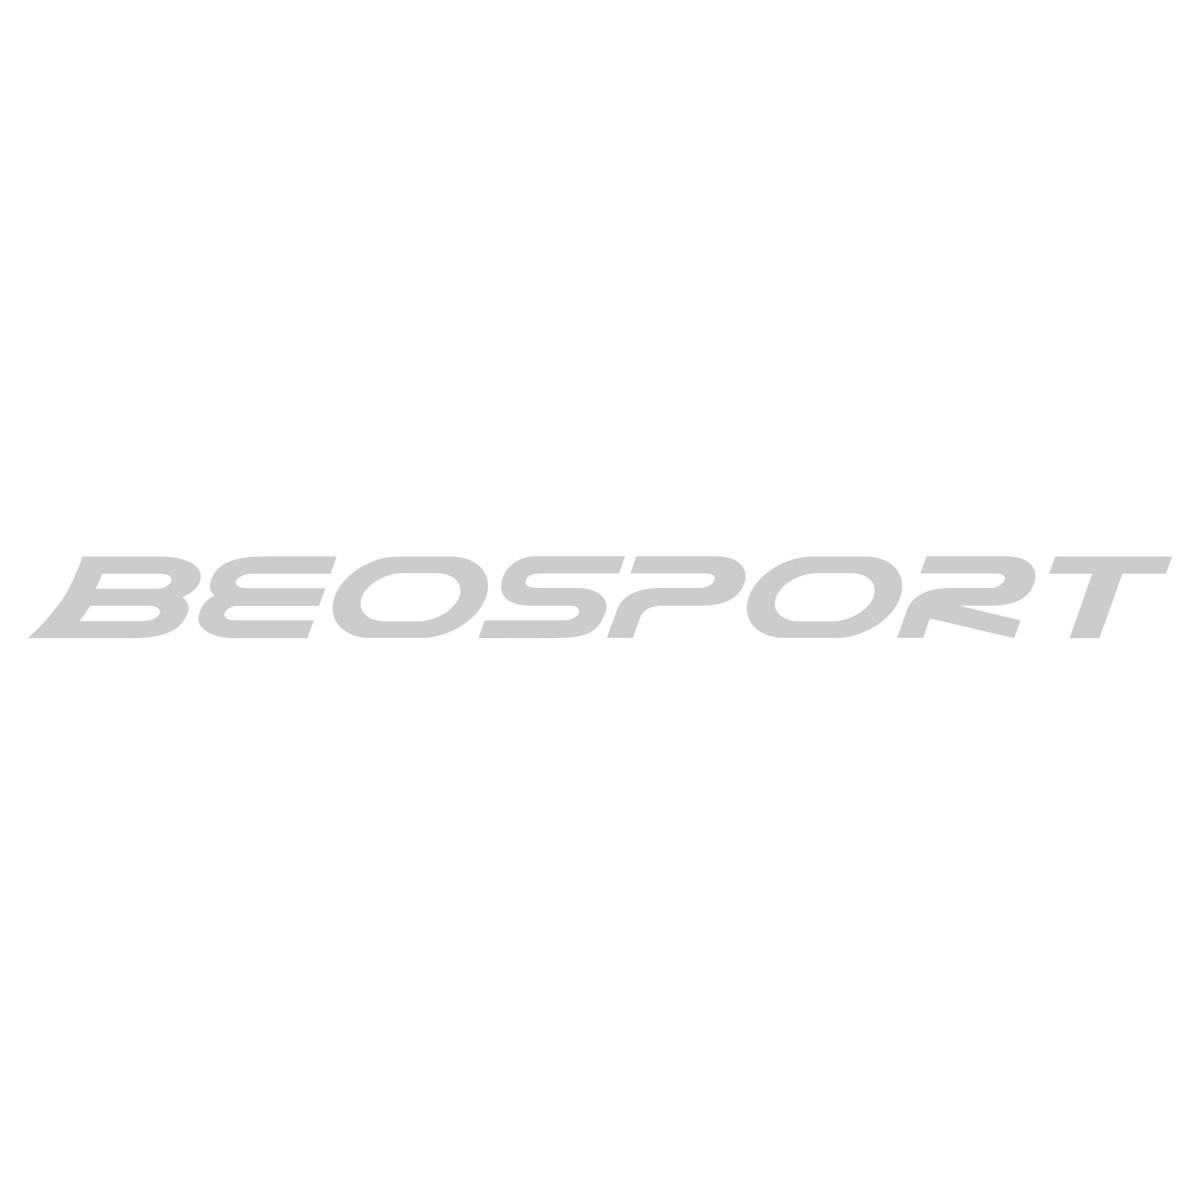 Wilson Element 12.2m 1.30mm žica za rekete